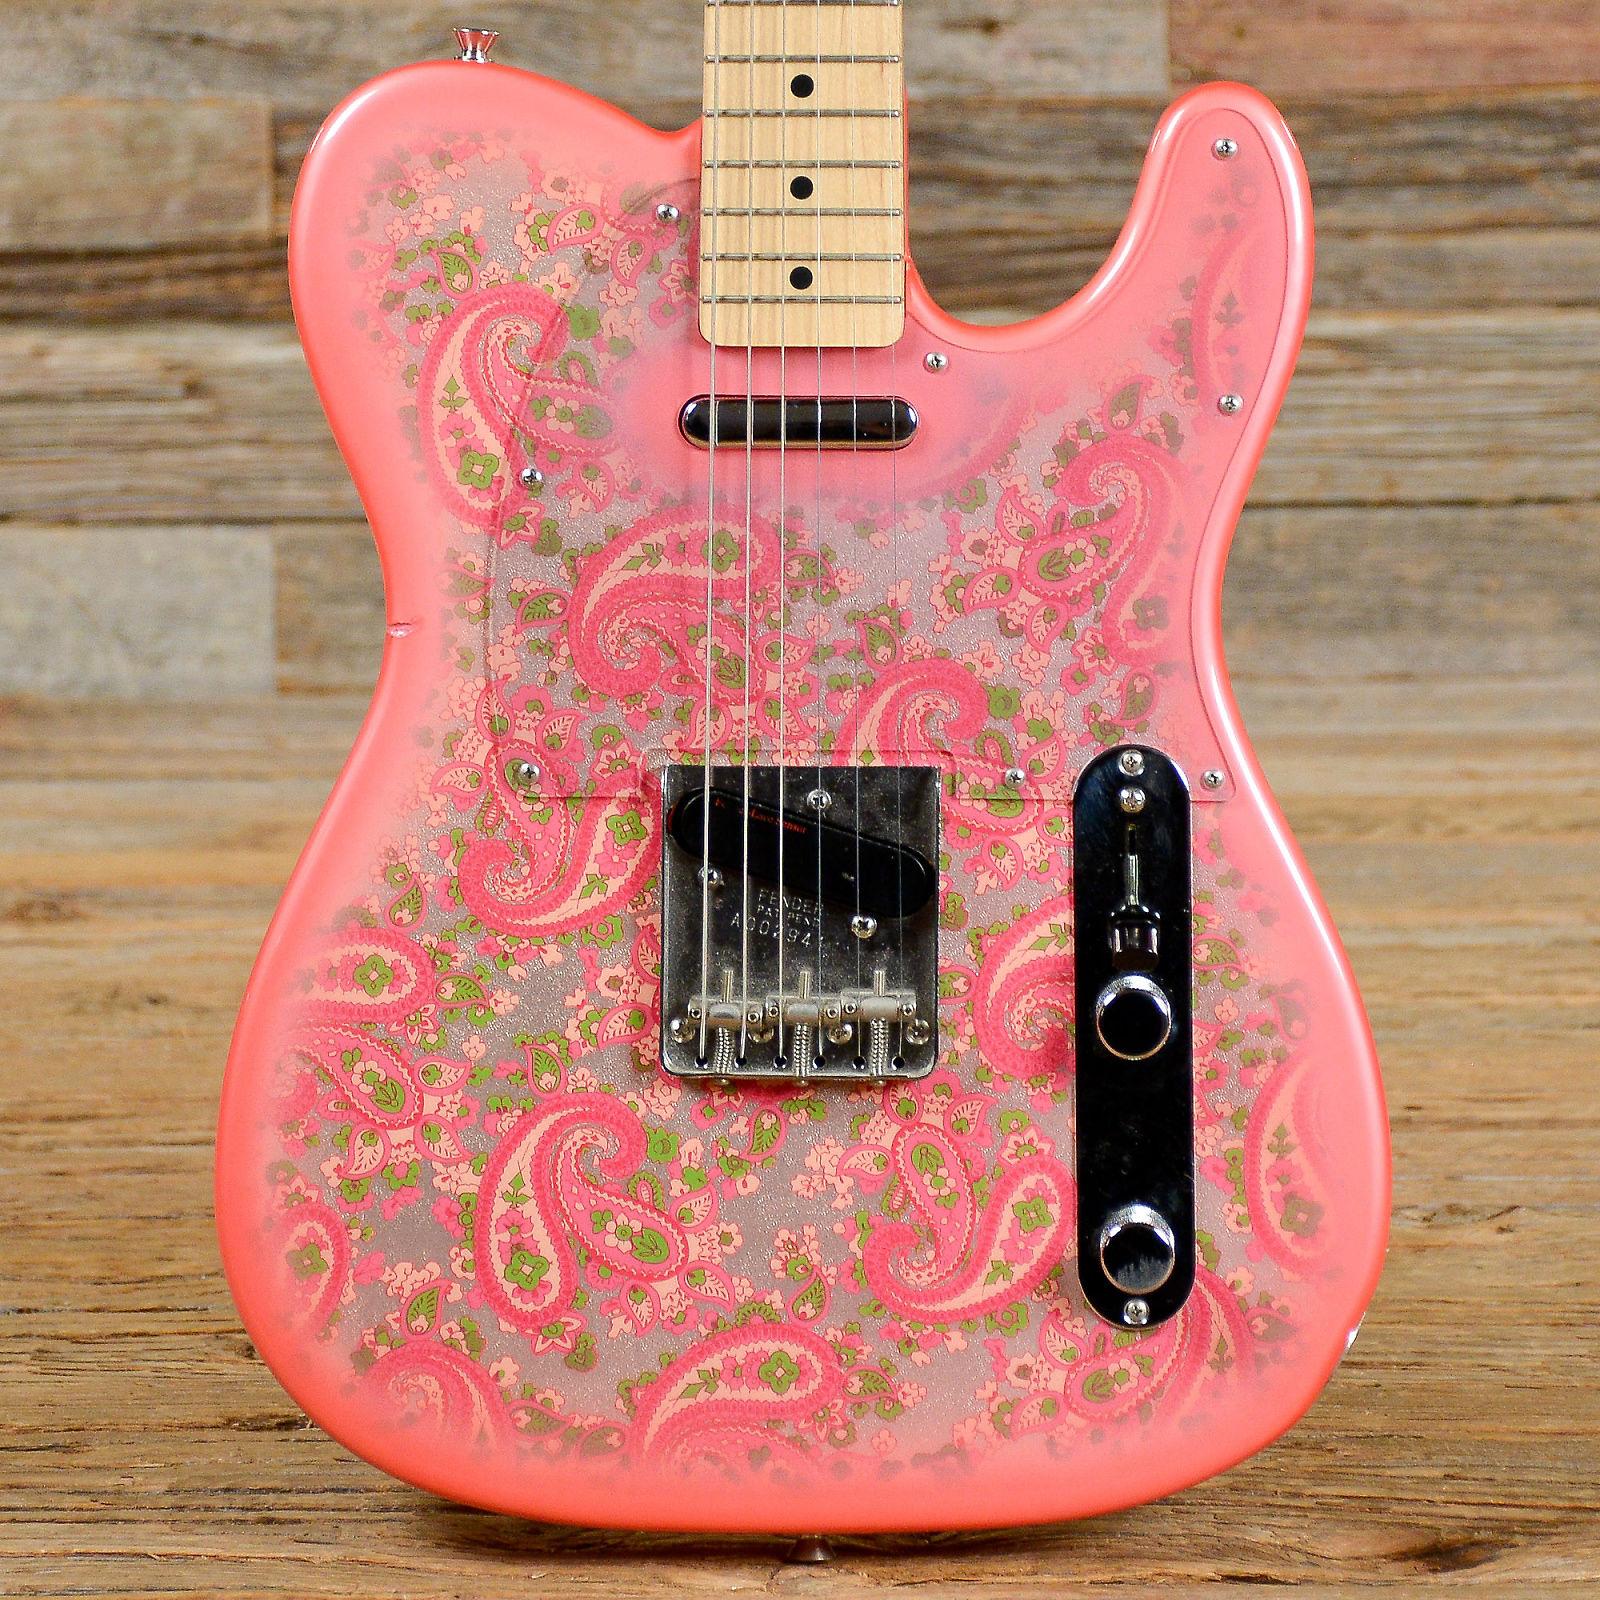 fender telecaster 39 69 reissue cij pink paisley reverb. Black Bedroom Furniture Sets. Home Design Ideas